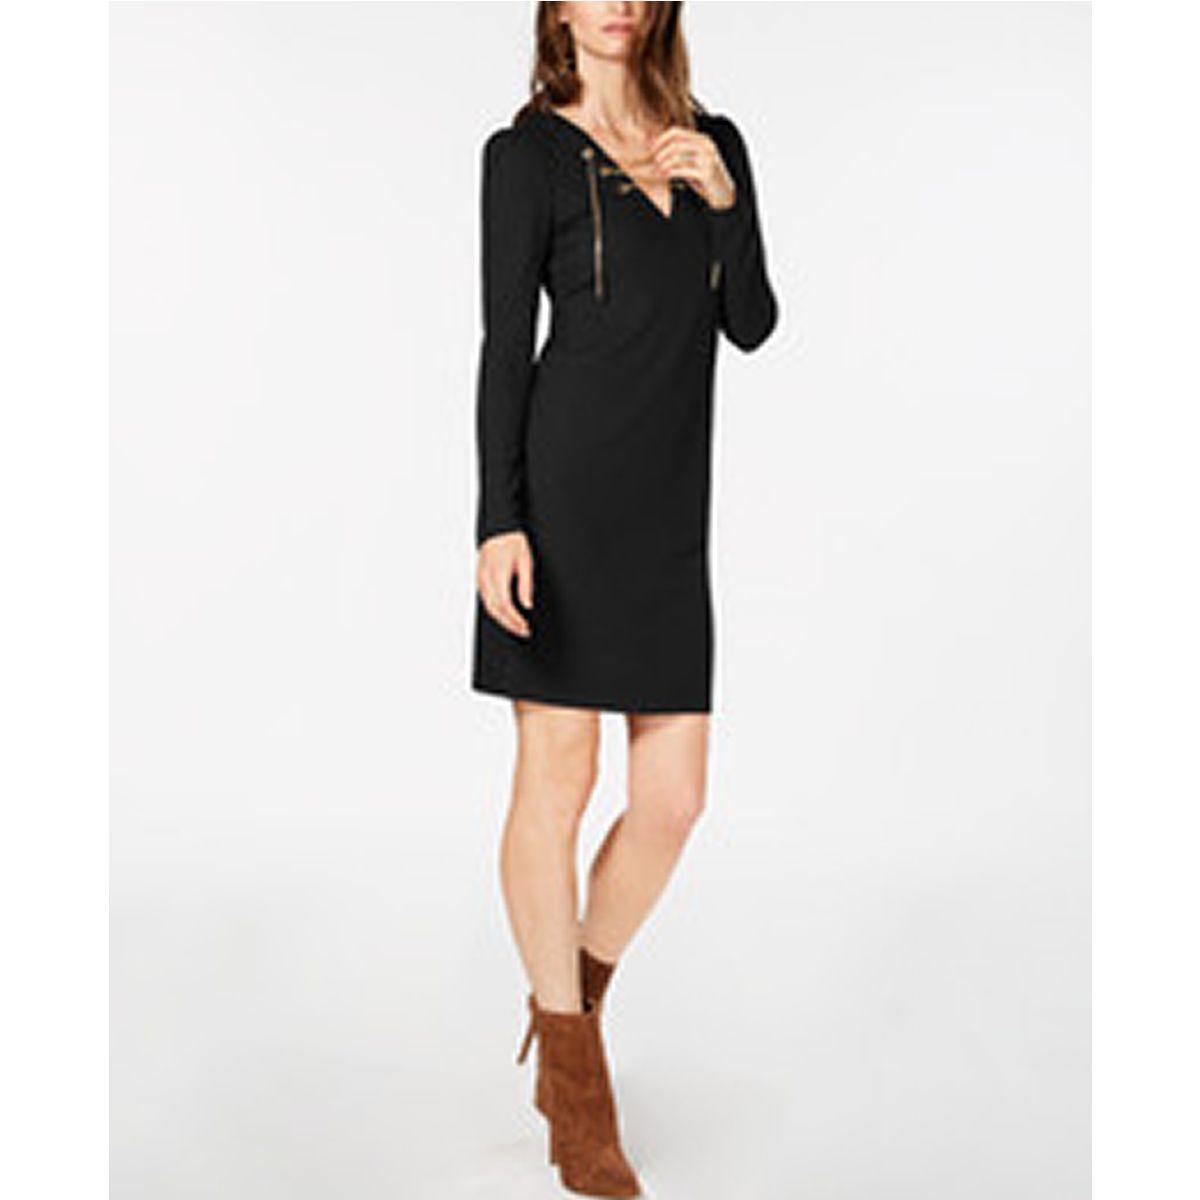 5a0a5d323dea Clearance Closeout MICHAEL Michael Kors Clothing for Women - Macy s